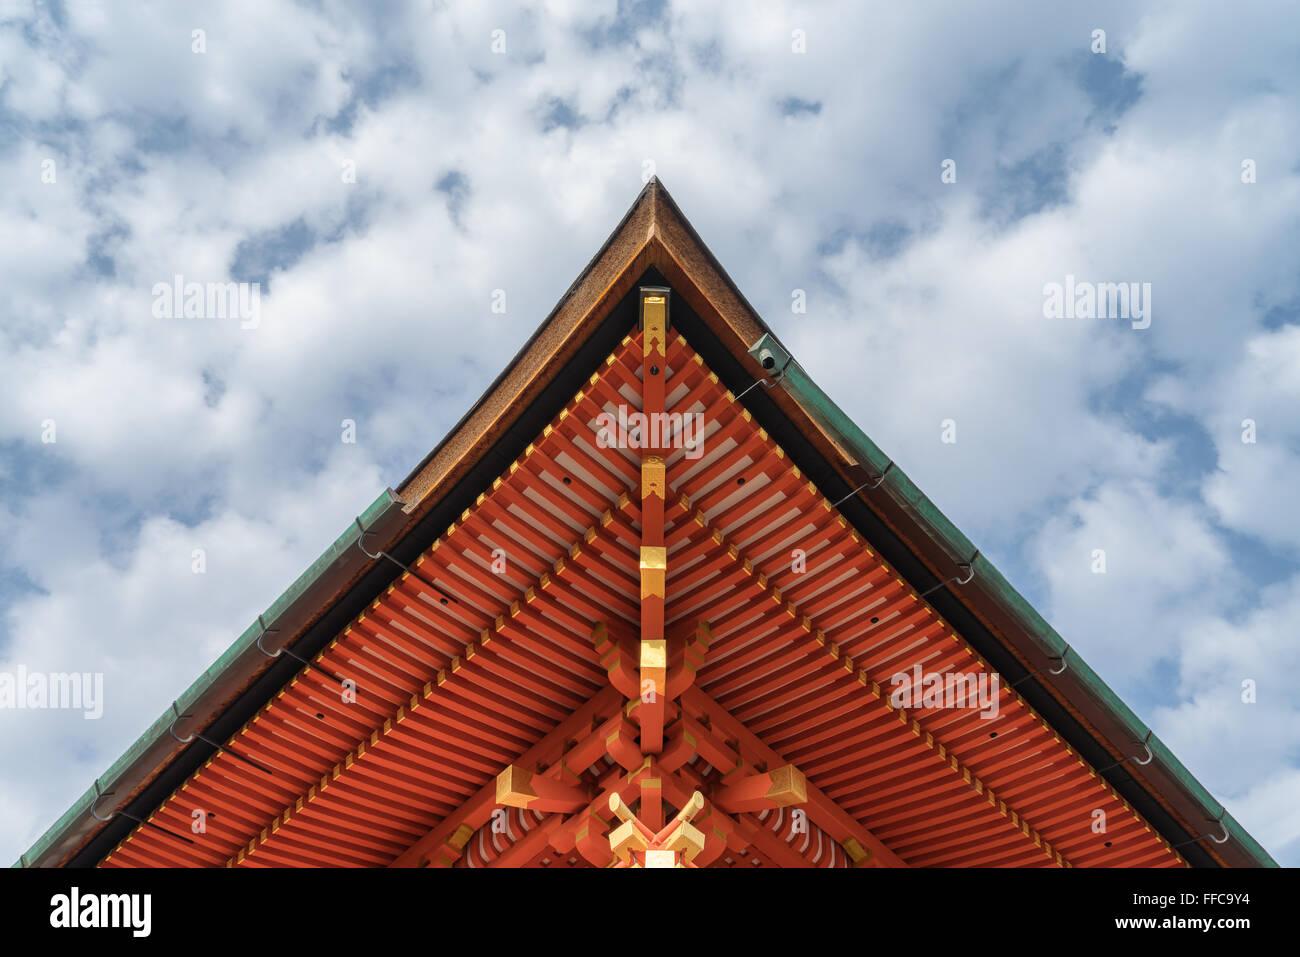 Fushimi Inari Shrine, Kyoto, Japan - Stock Image